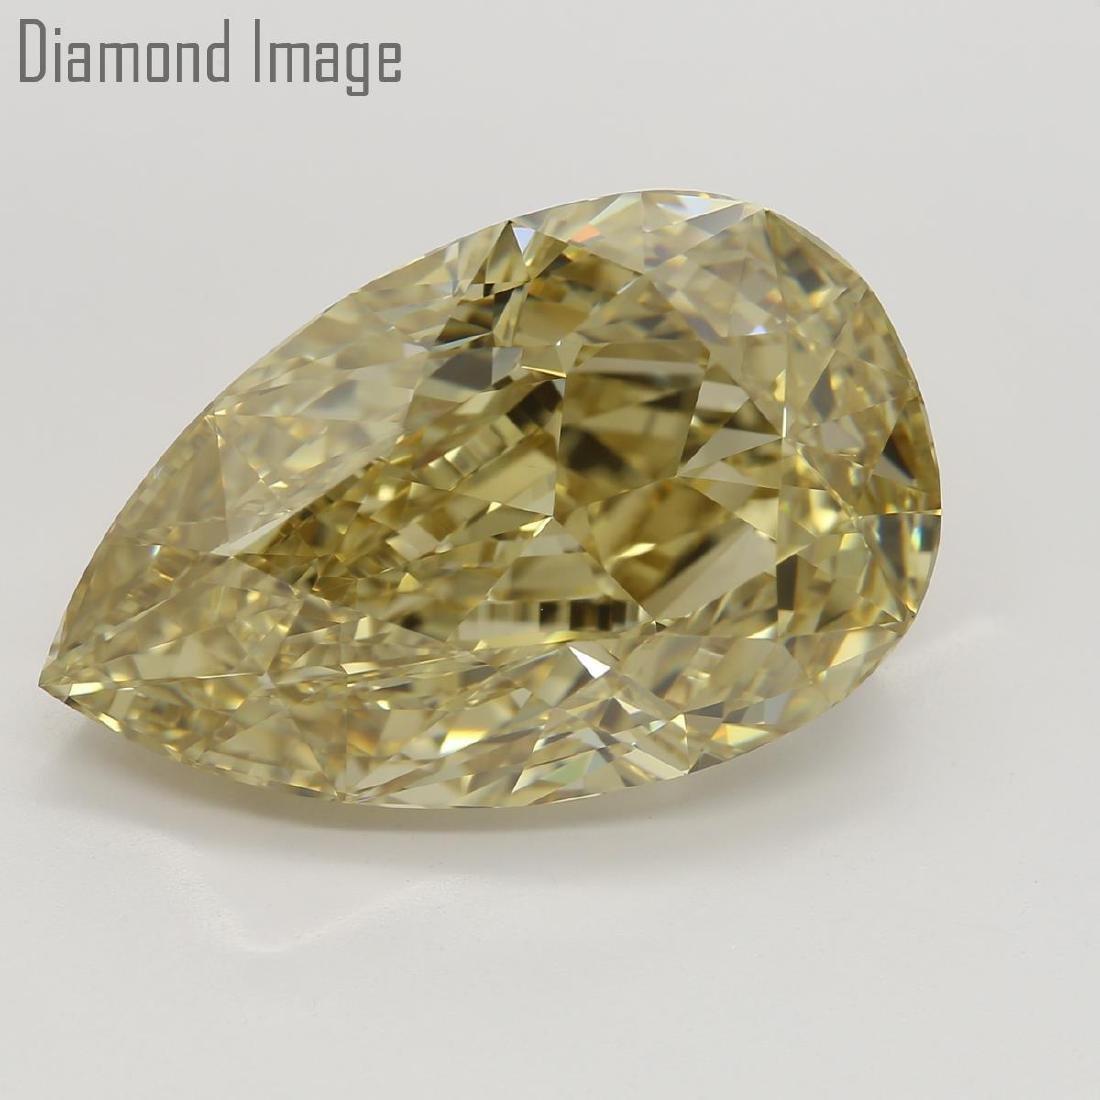 10.03 ct, Natural Color/VS2, Pear cut Diamond